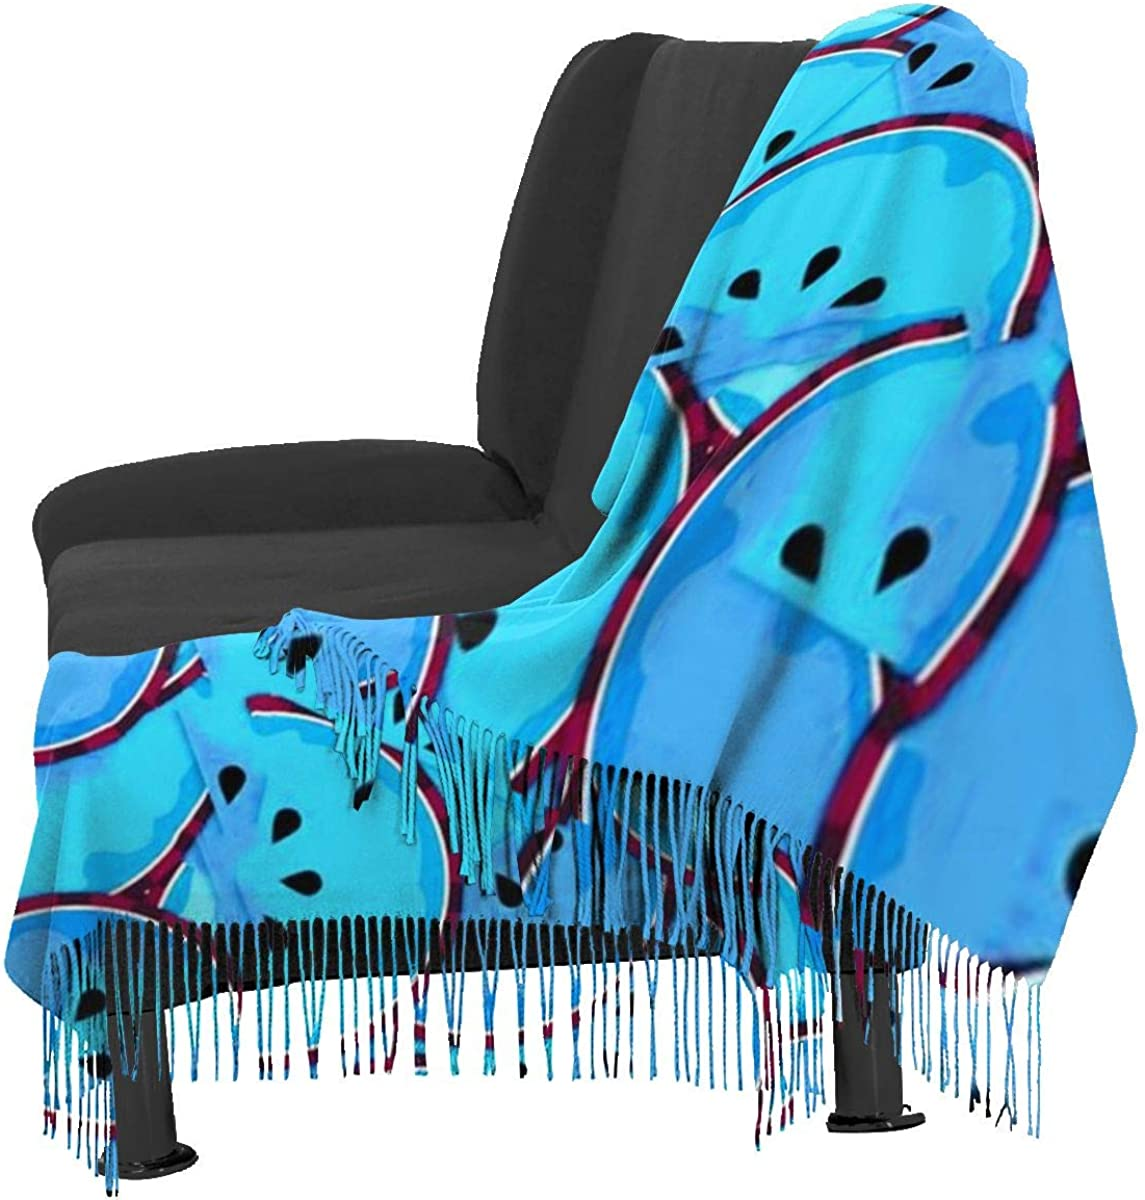 Funny Blue Watermelon Women's Winter Warm Scarf Fashion Long Large Soft Cashmere Shawl Wrap Scarves